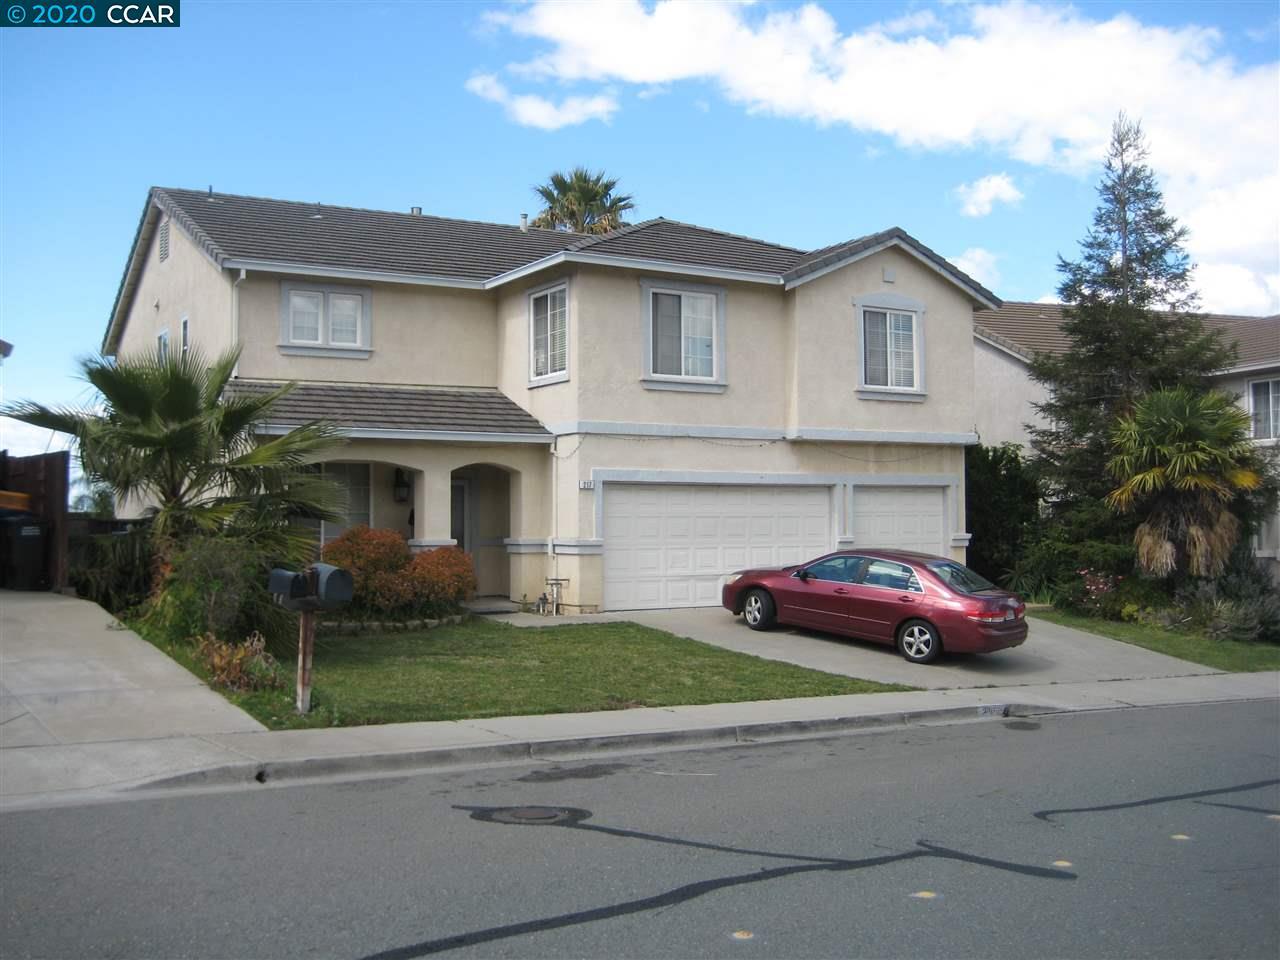 217 Cloverbrook Cir Pittsburg, CA 94565